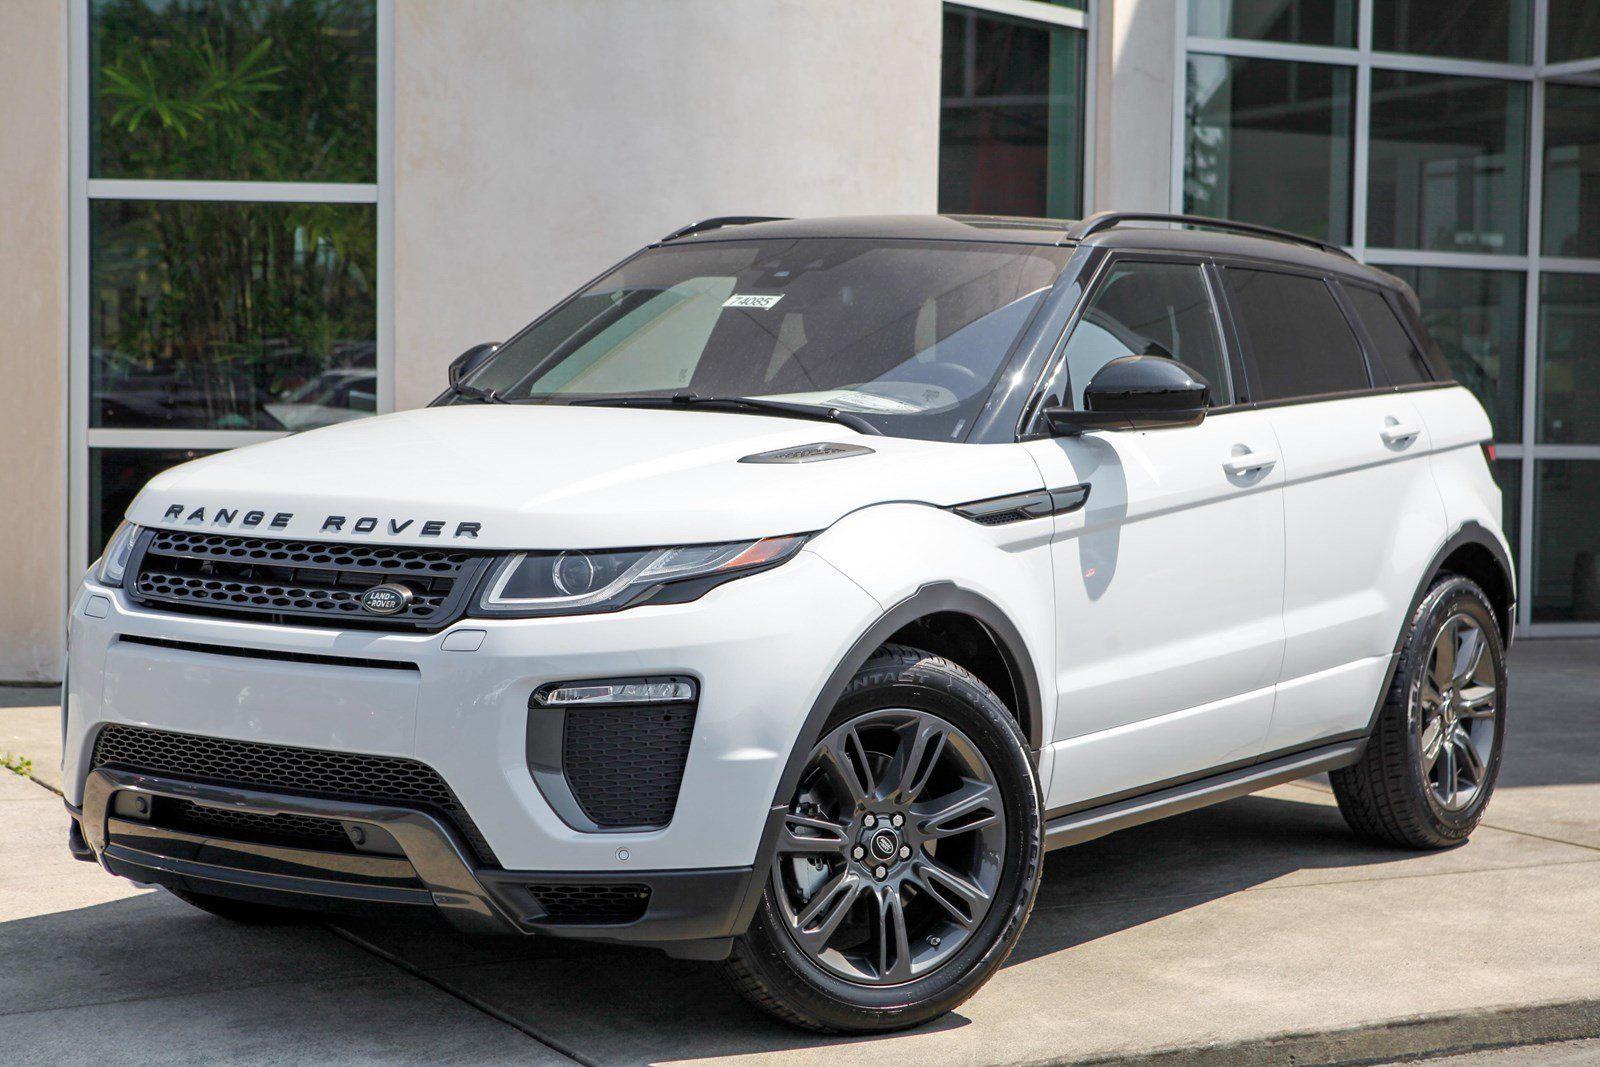 Land Rover Bellevue >> 132 New Cars Suvs In Stock Redmond Vroom Vroom Range